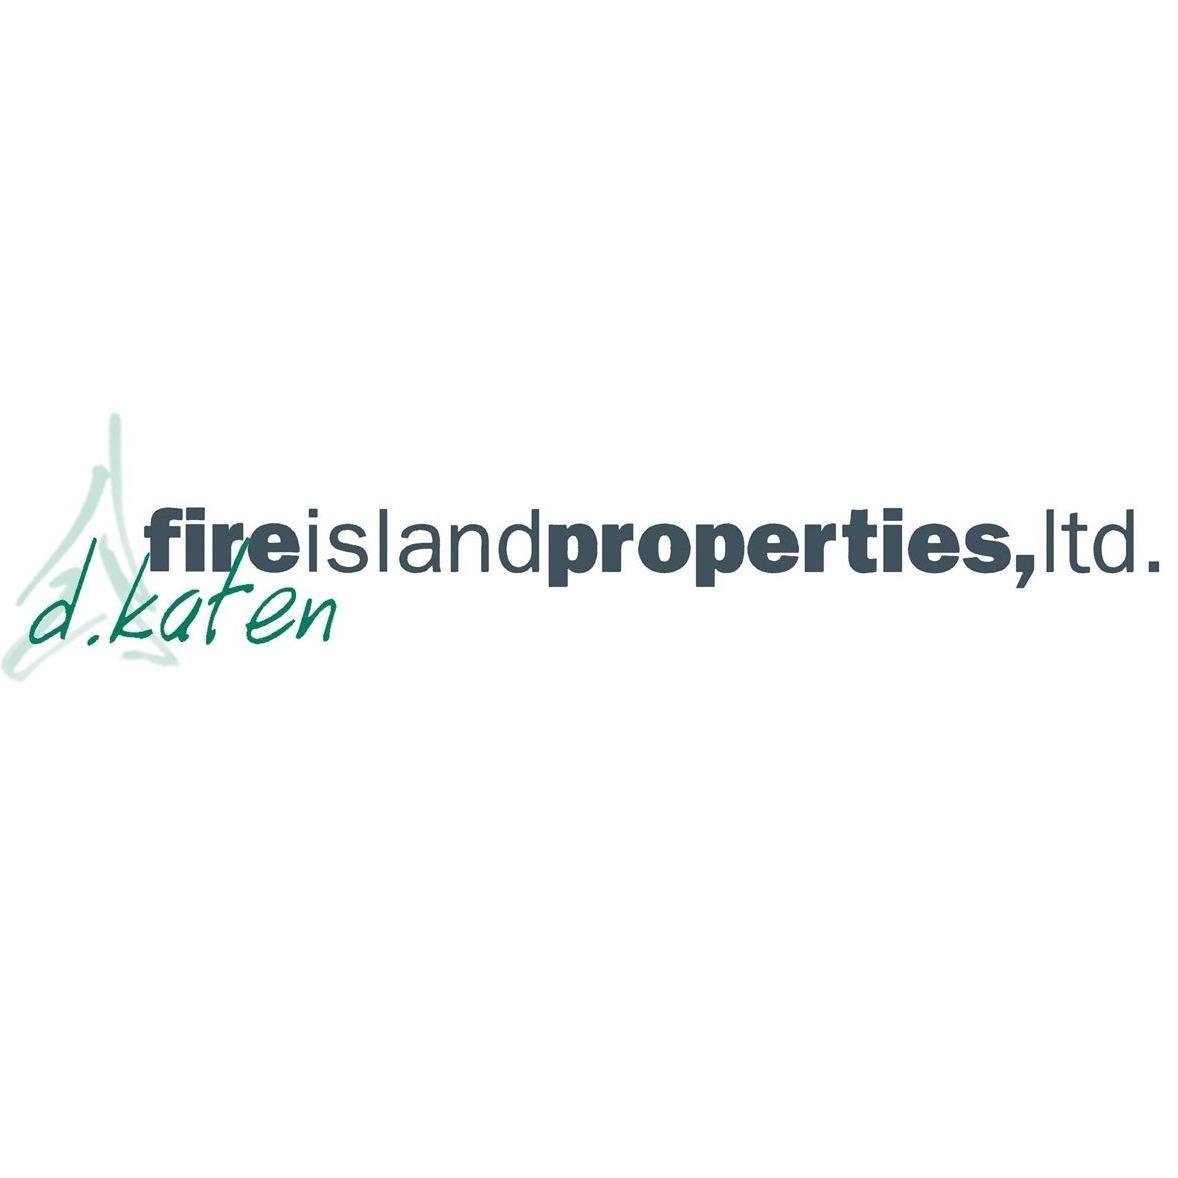 D.Katen Fire Island Properties, Ltd. - Fire Island Rentals & Sales